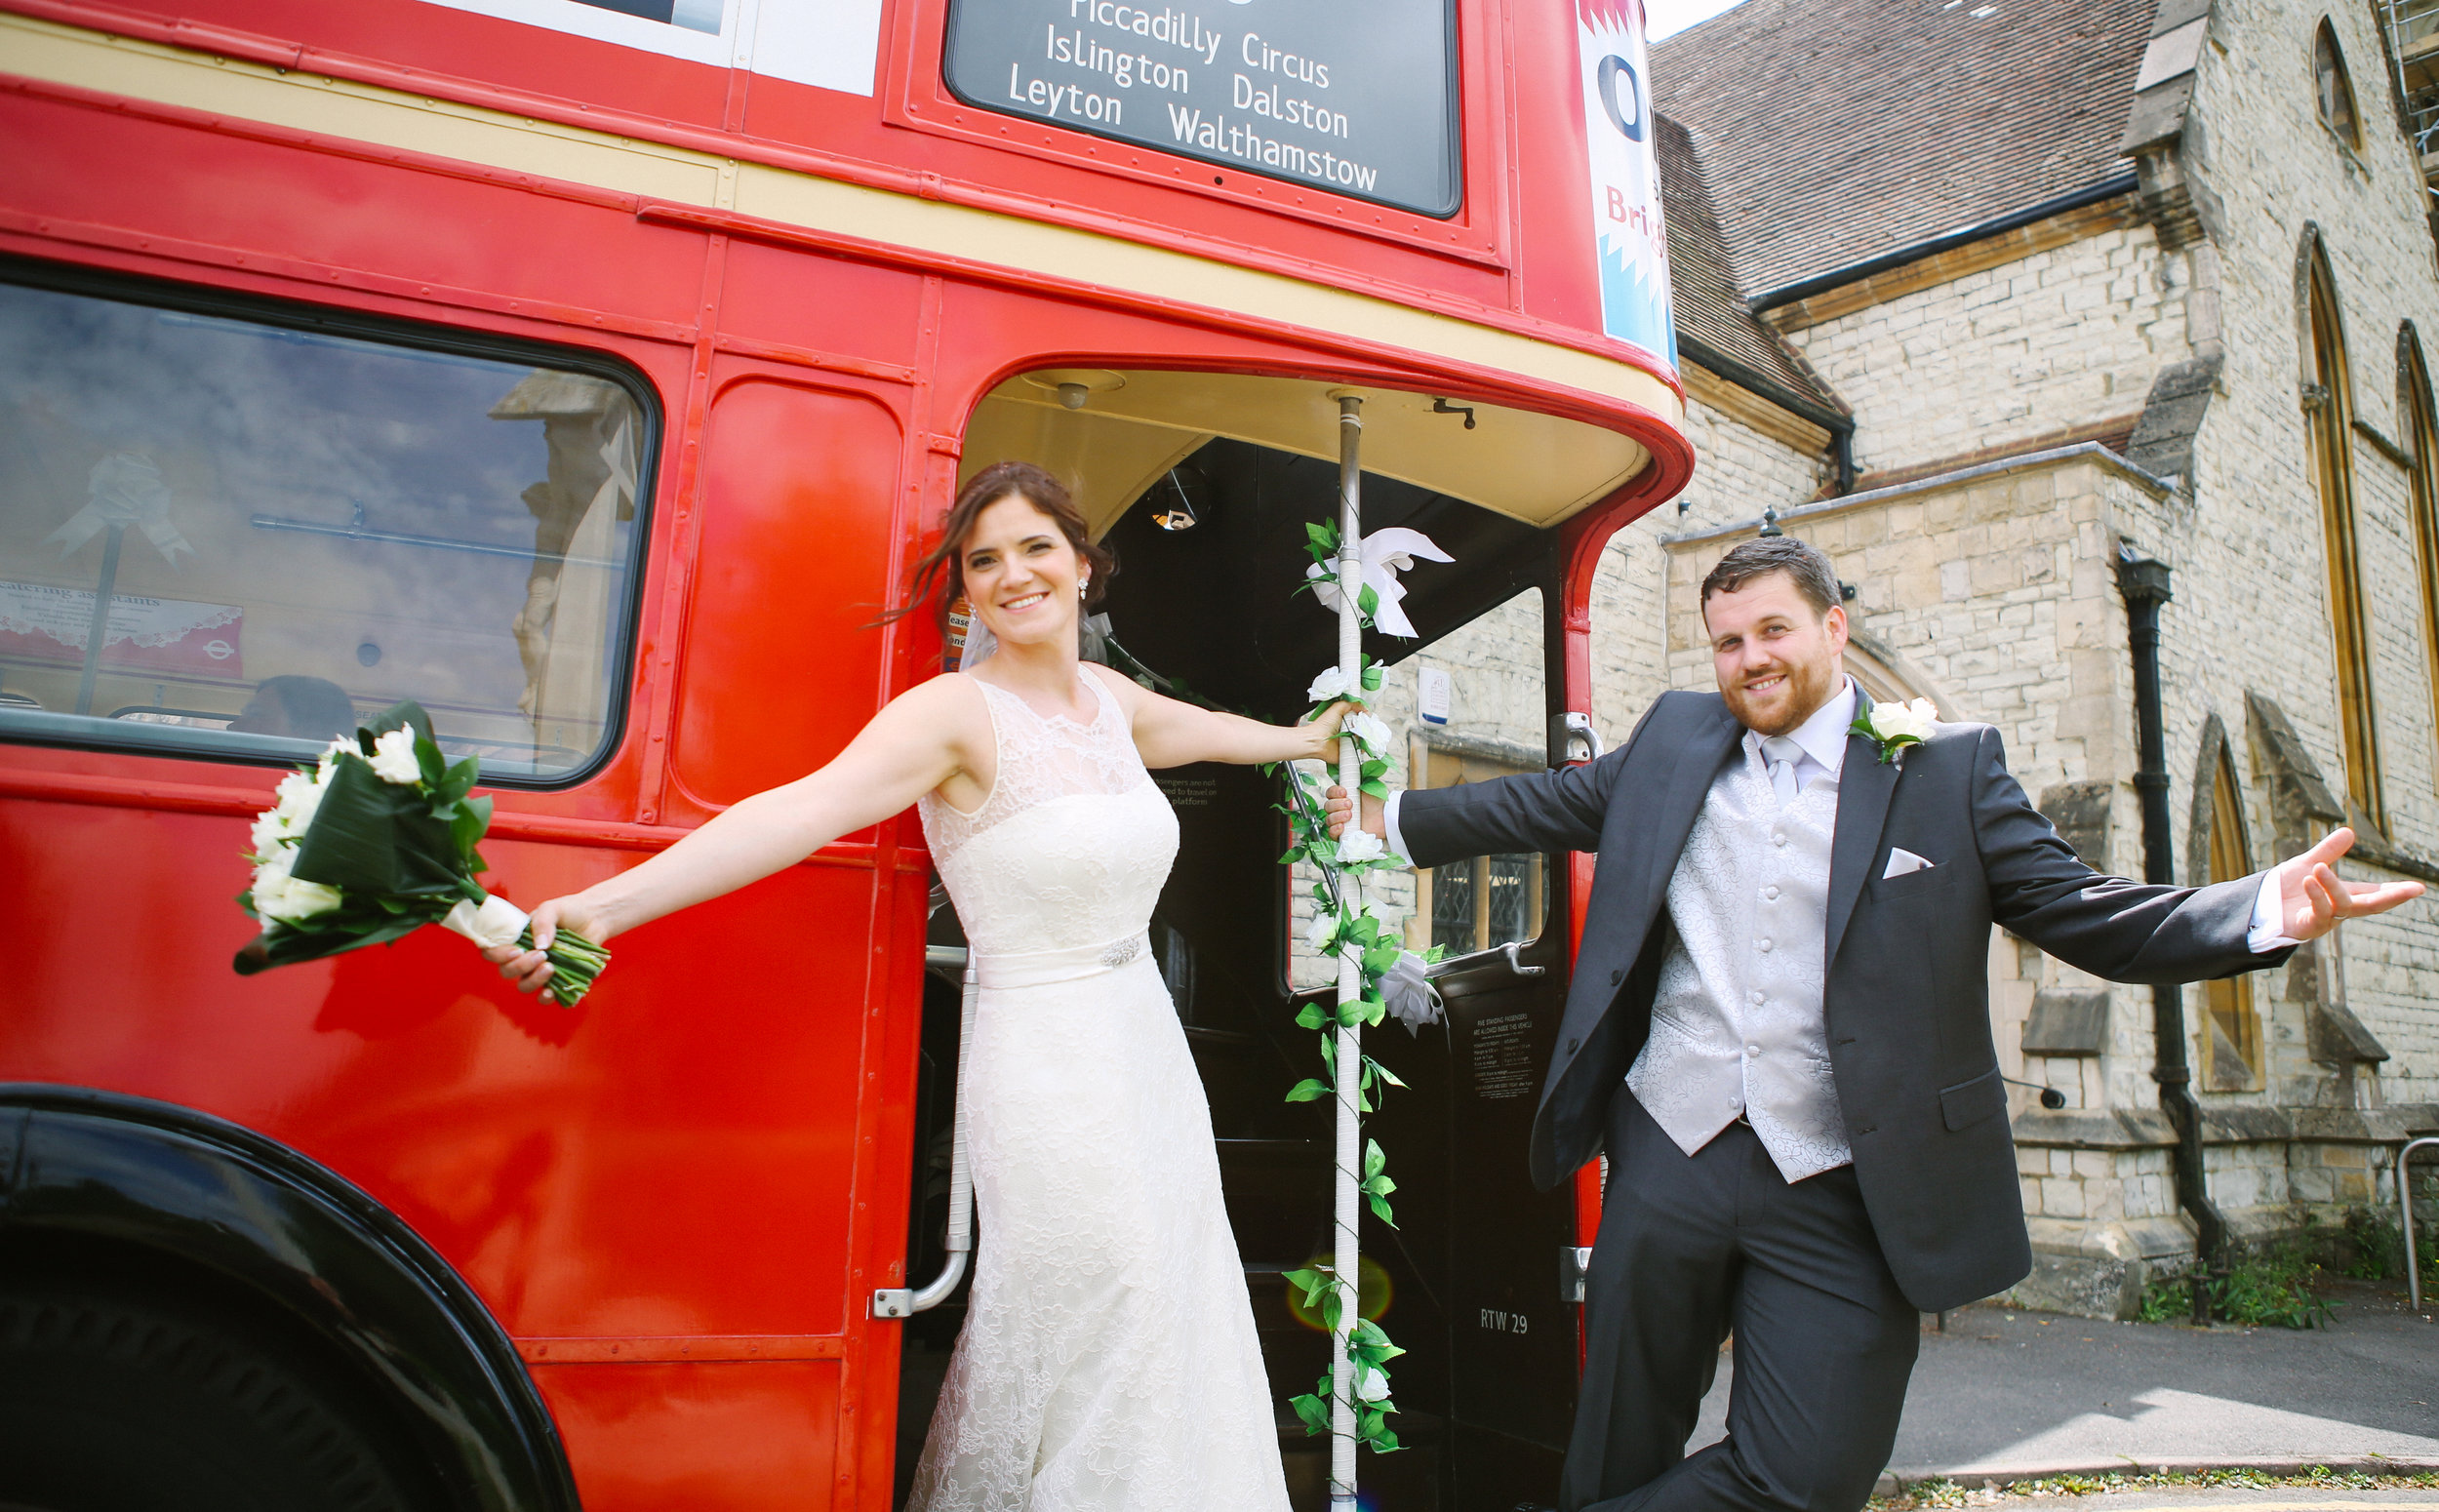 reigate-surrey-london-wedding-photography-routemaster-62